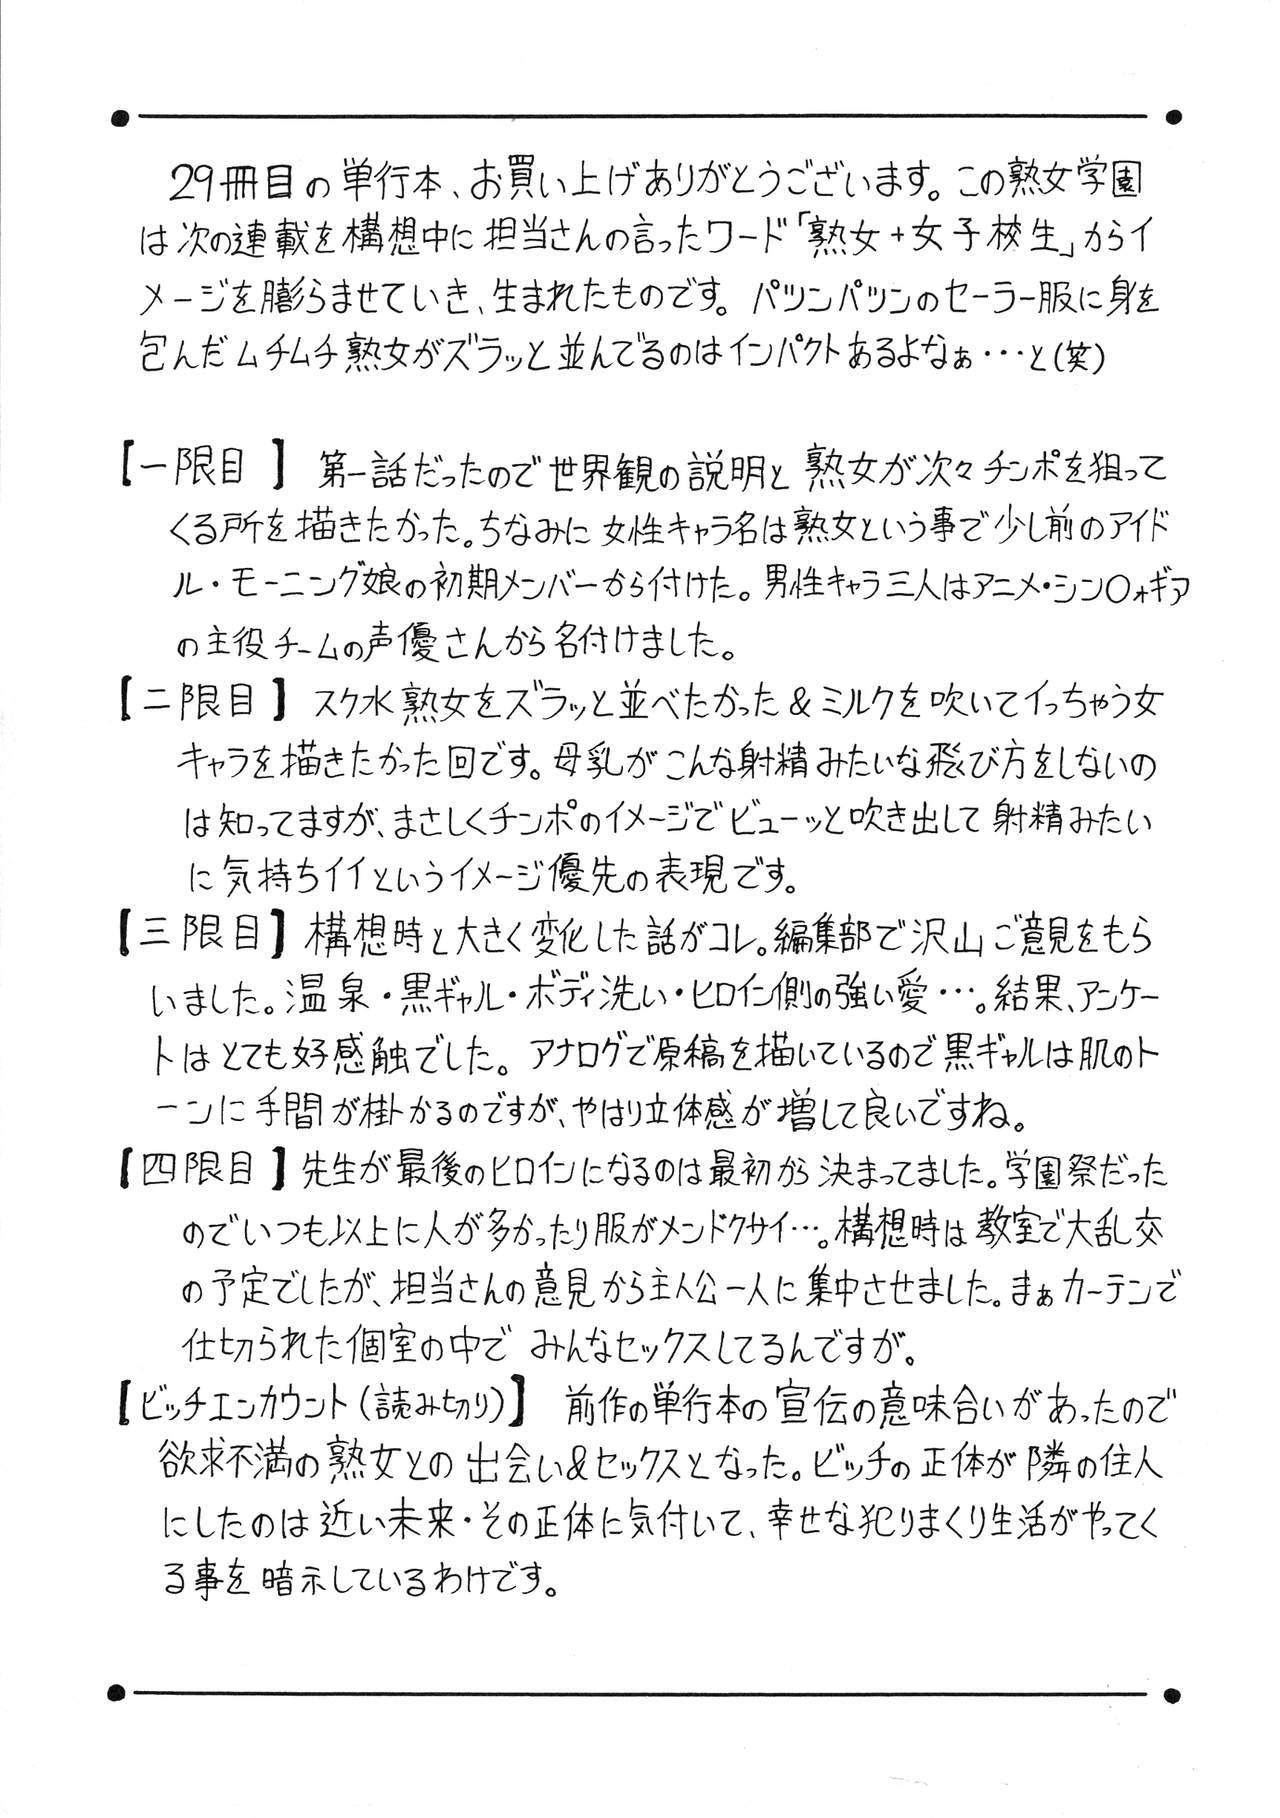 [Jamming] Jukujo Gakuen ~ Classmate wa Zen'in Jukujo ~ Okiniiri Touroku 168